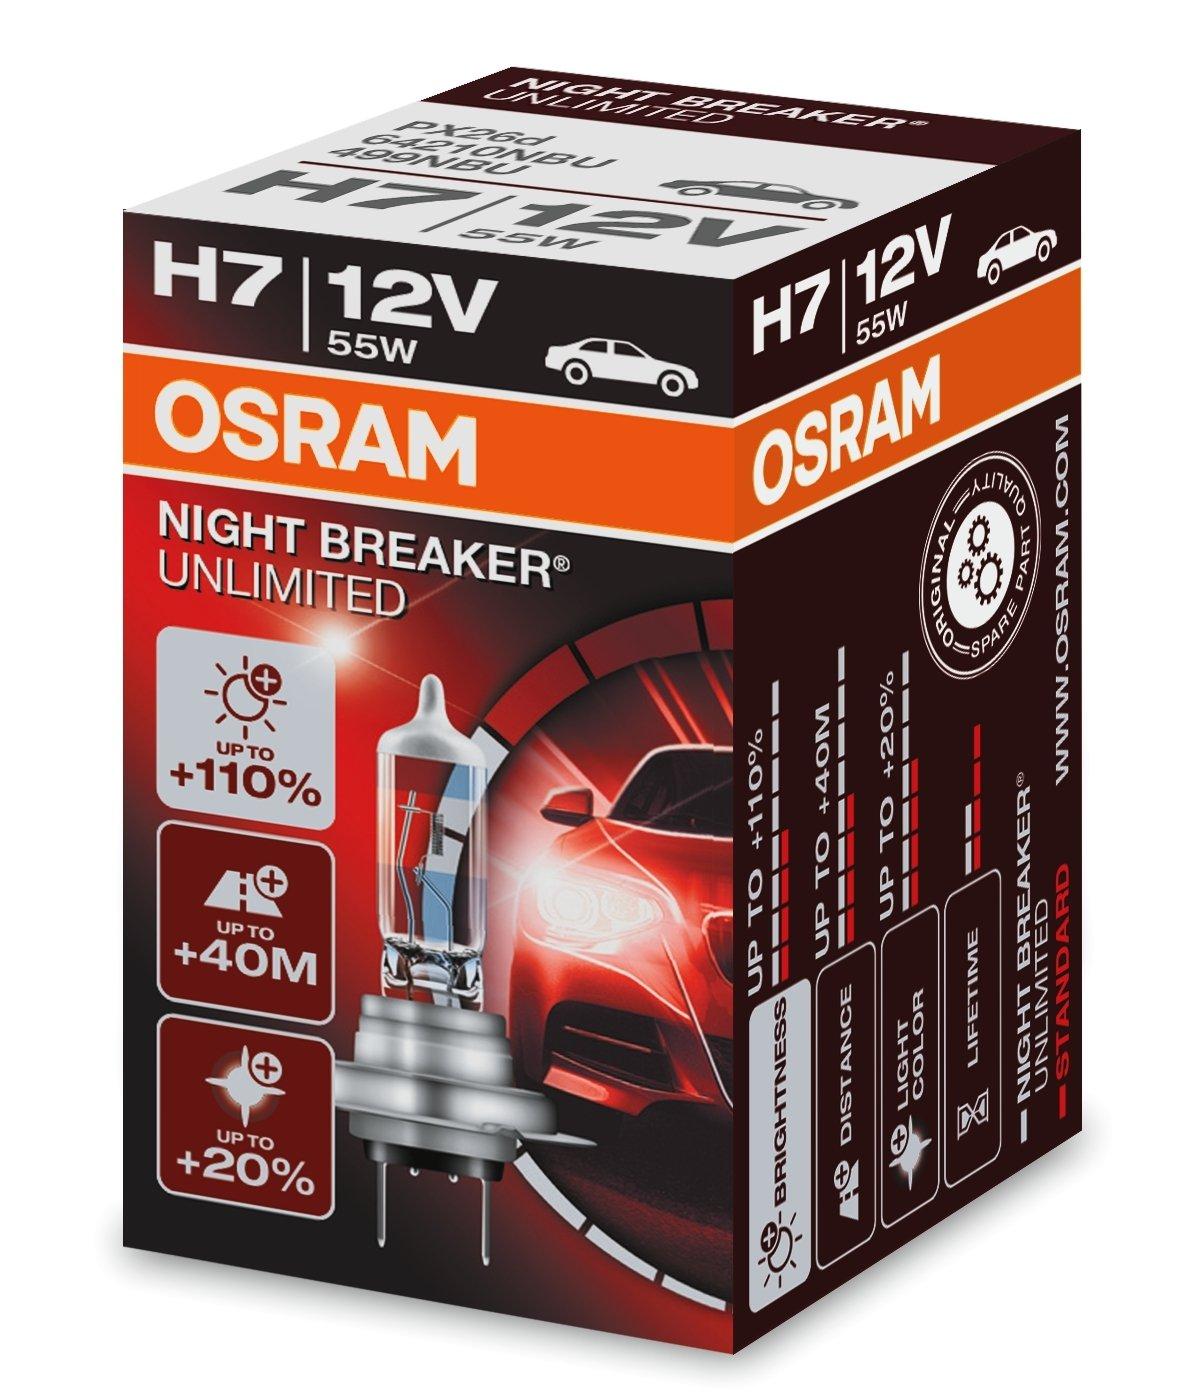 Osram 4X H7 12V 55W NIGHTBREAKER Unlimited 110/% 40m Halogen Lampen